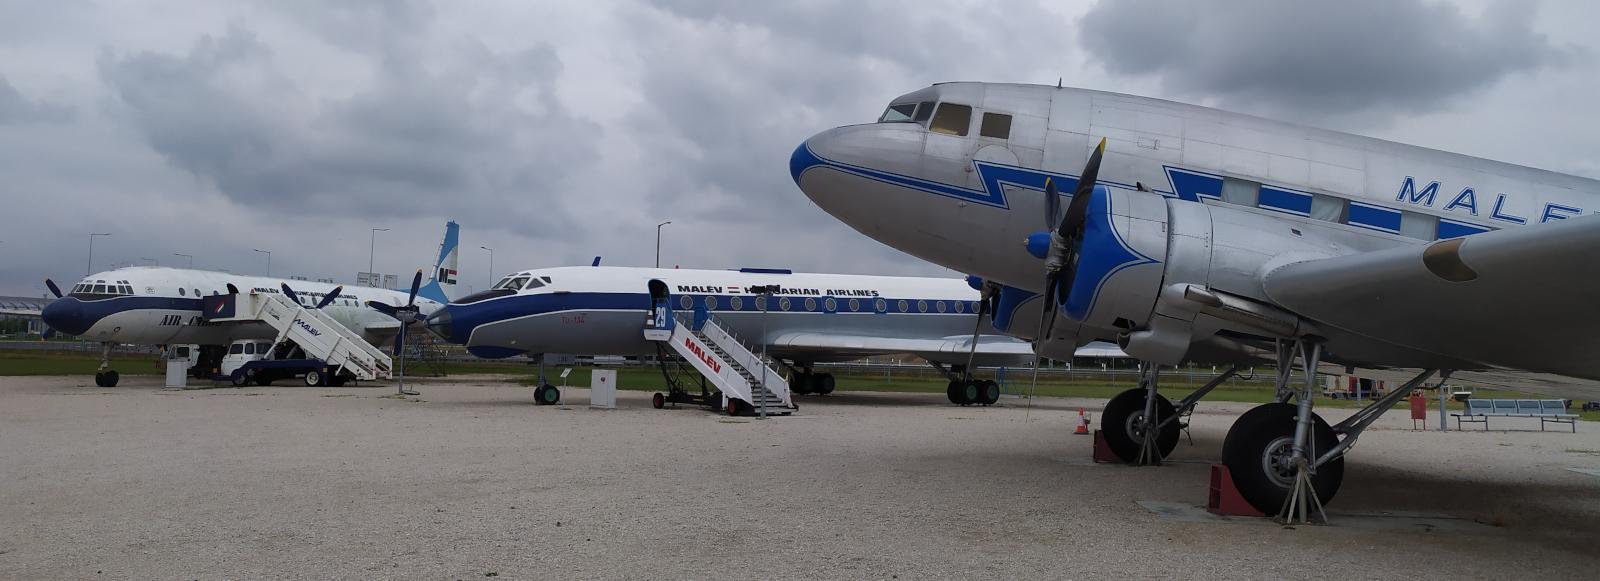 aeropark-01_1.jpg